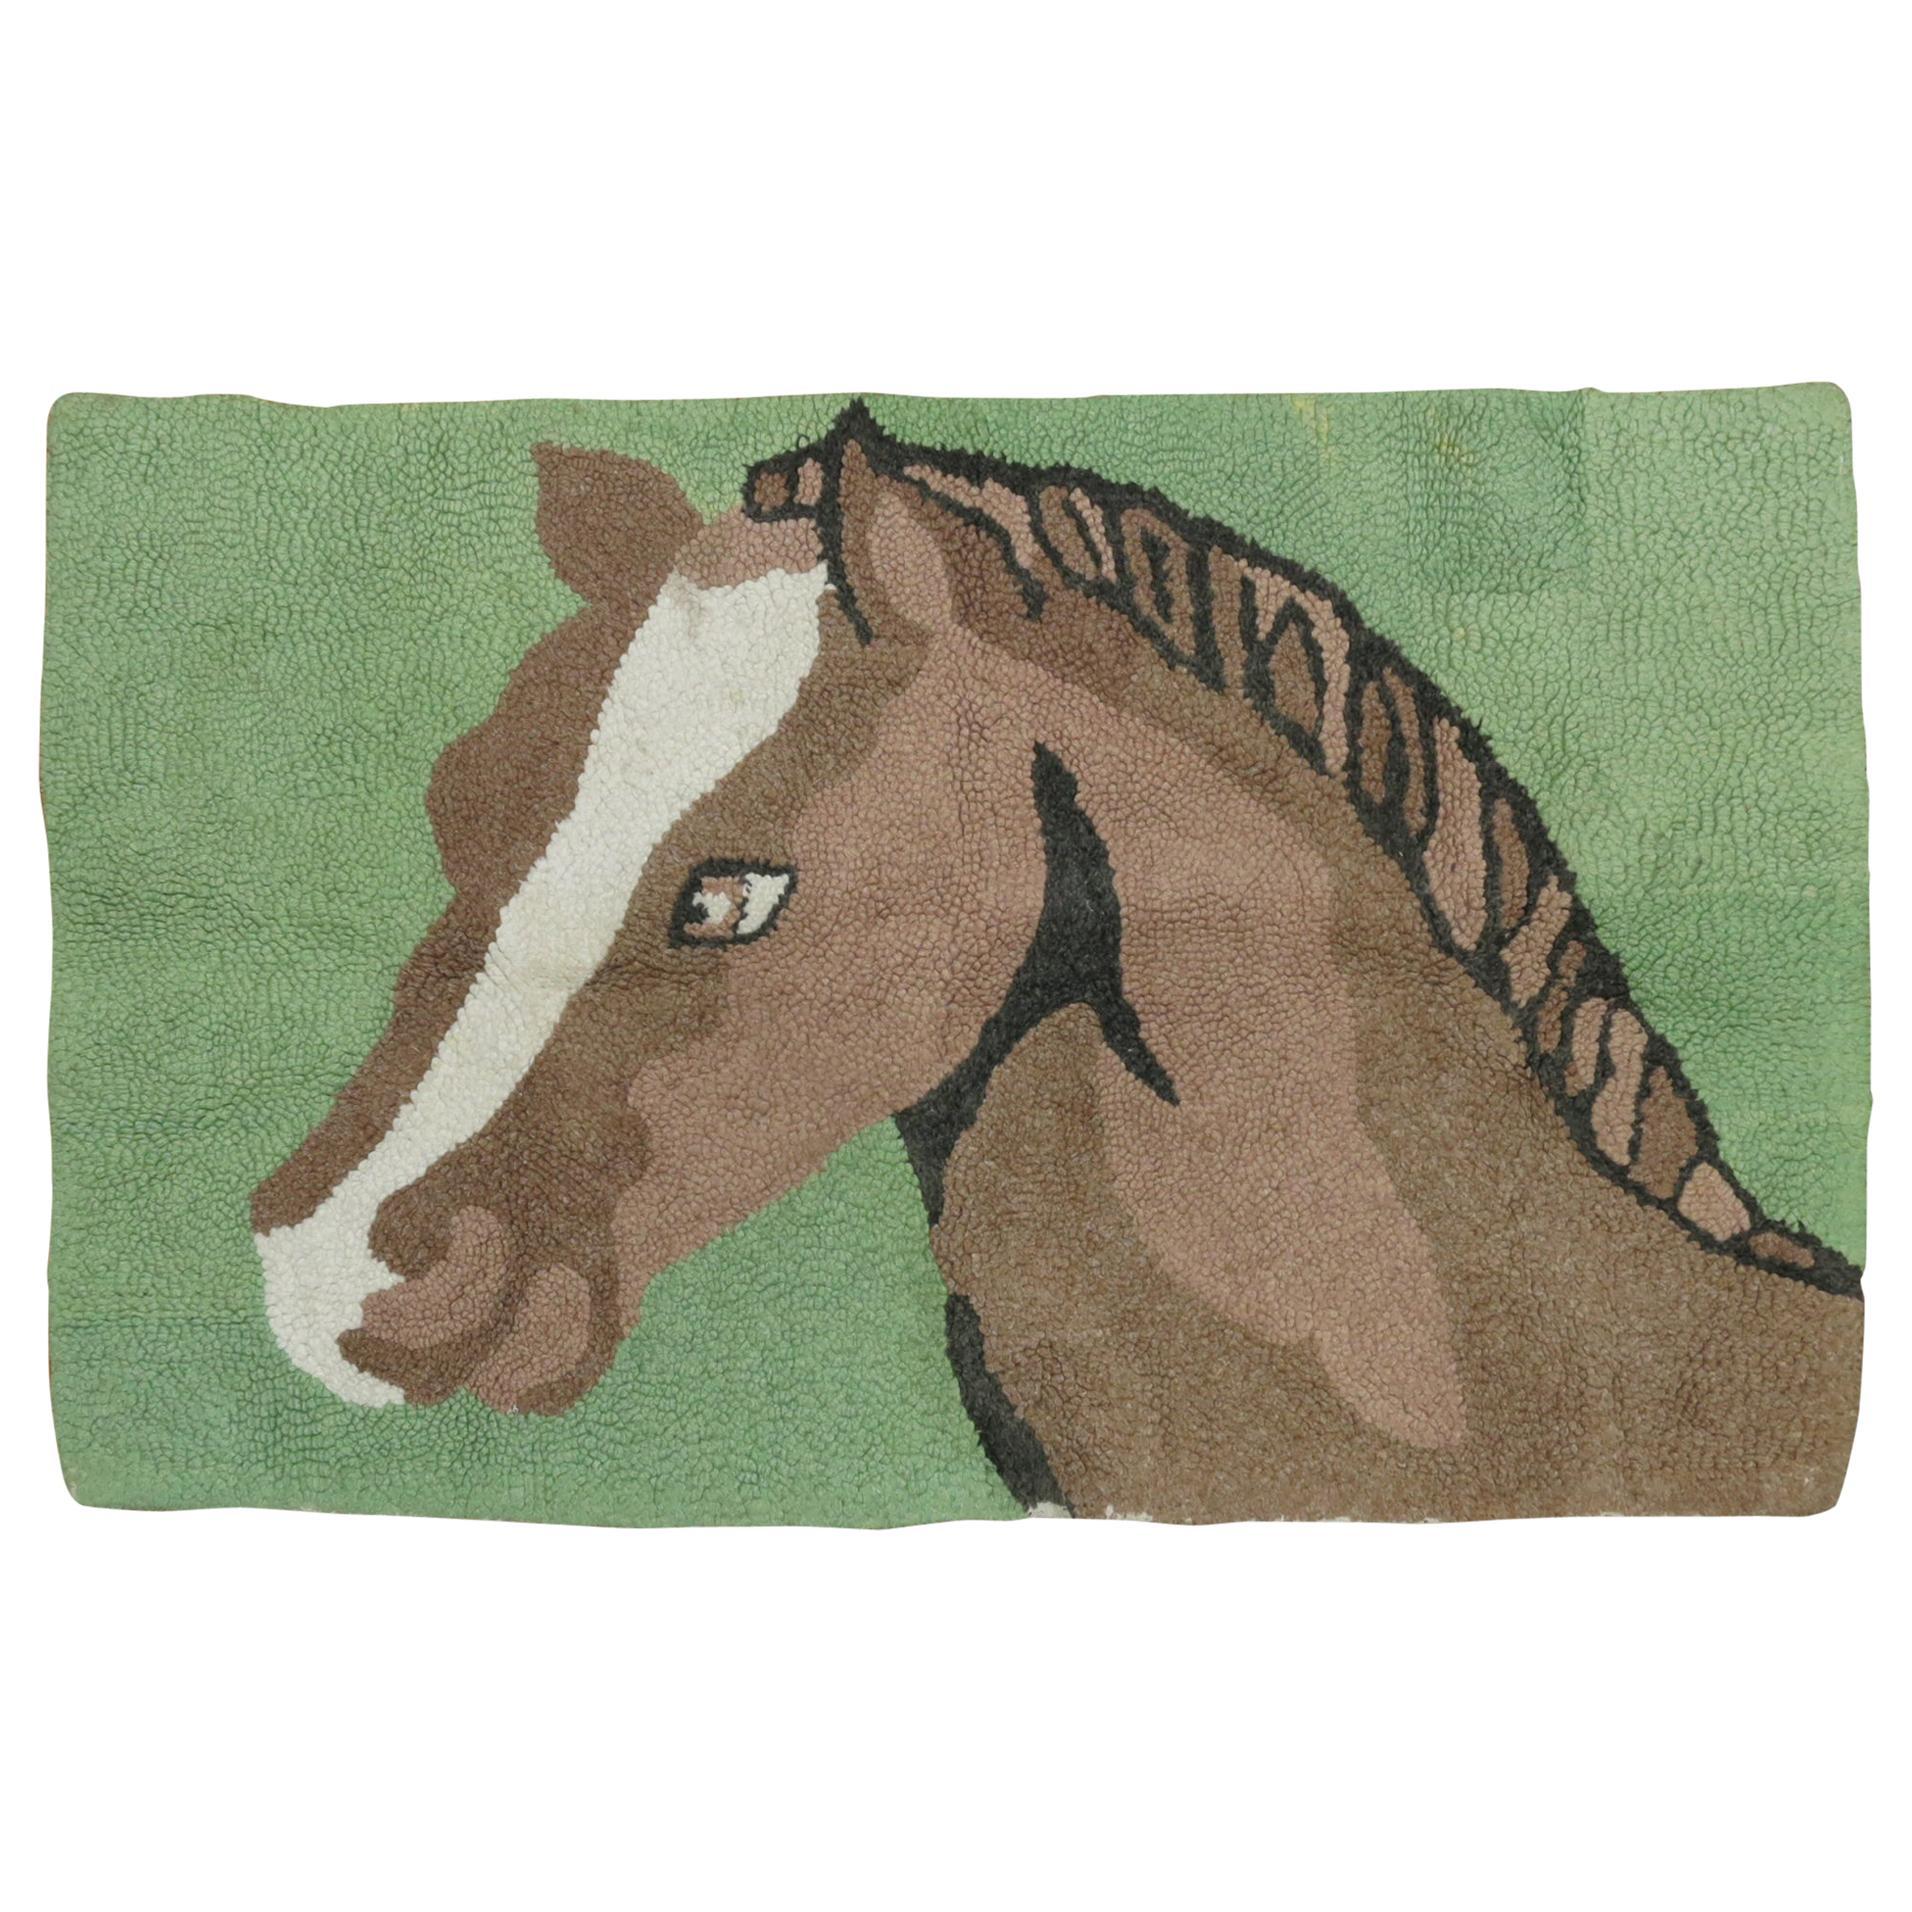 American Hooked Horse Rug